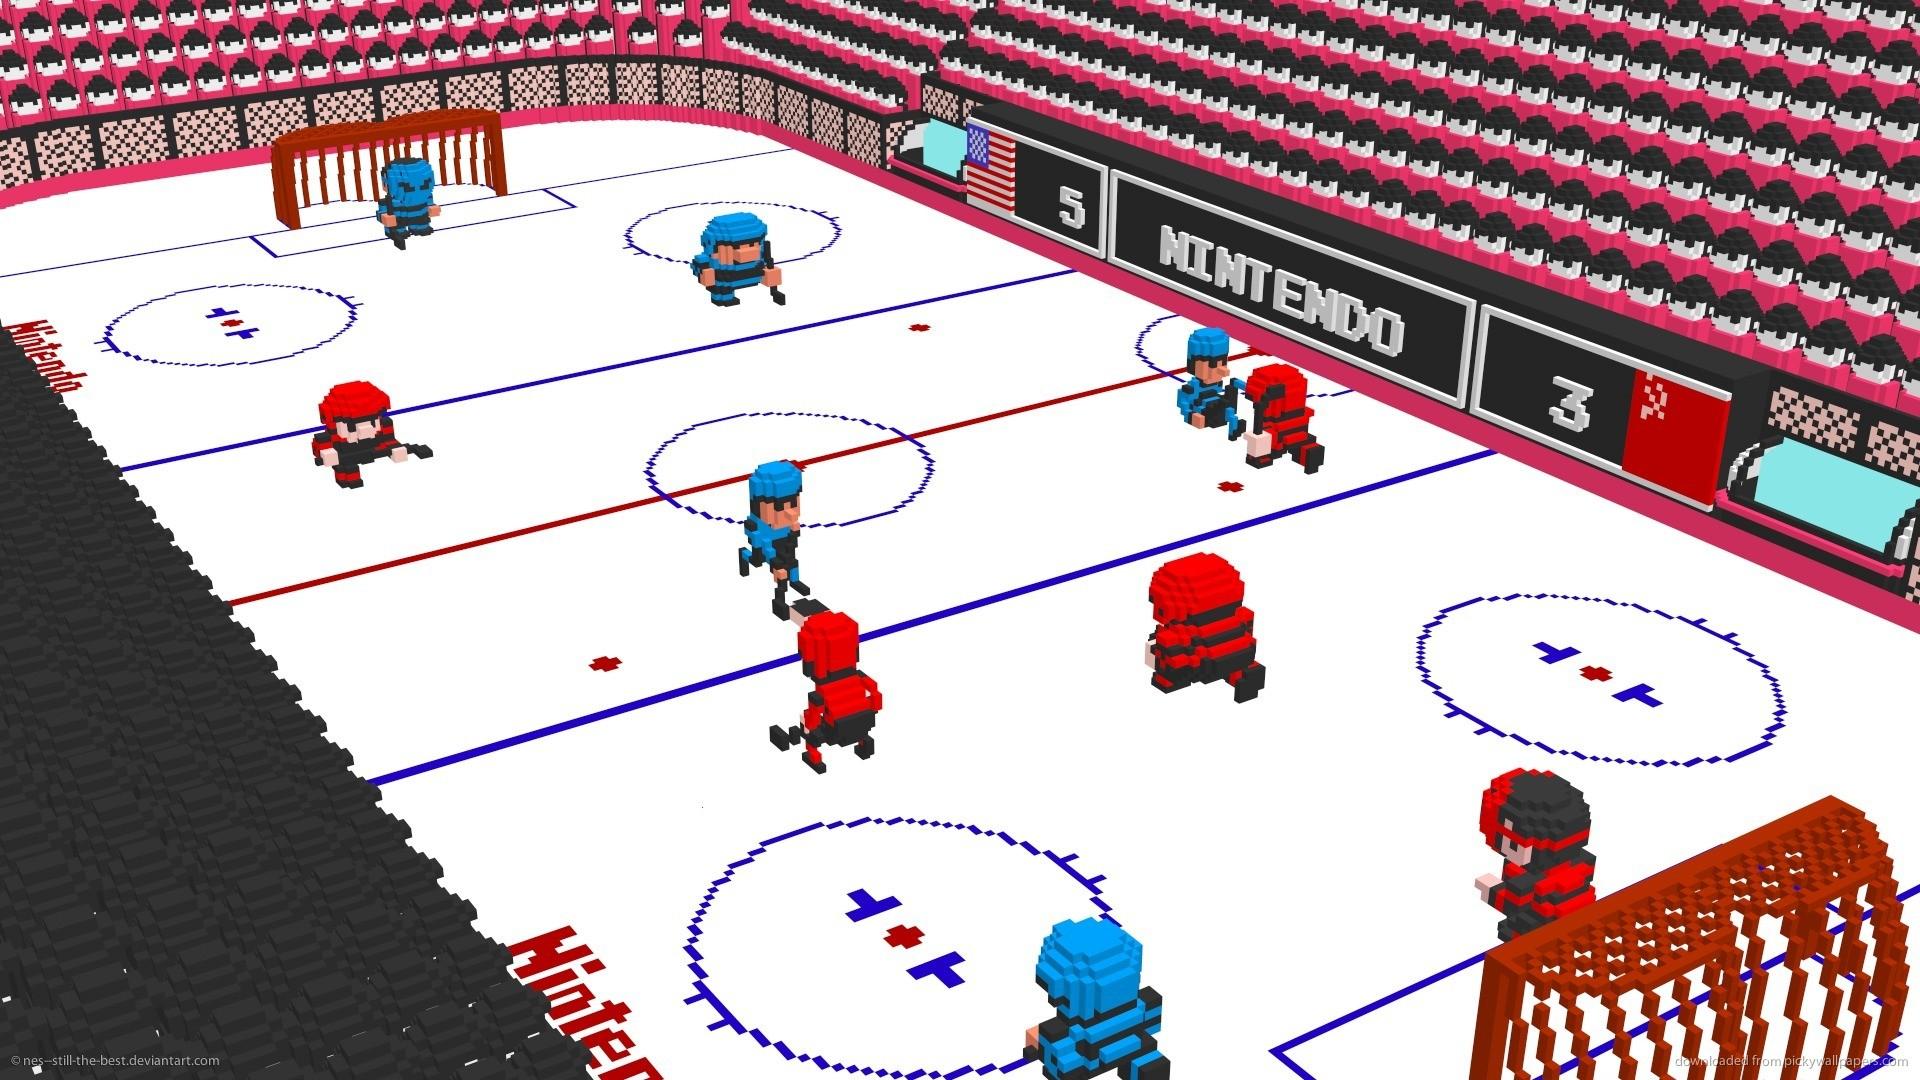 Nintendo 3D Ice Hockey 2 for 1920×1080